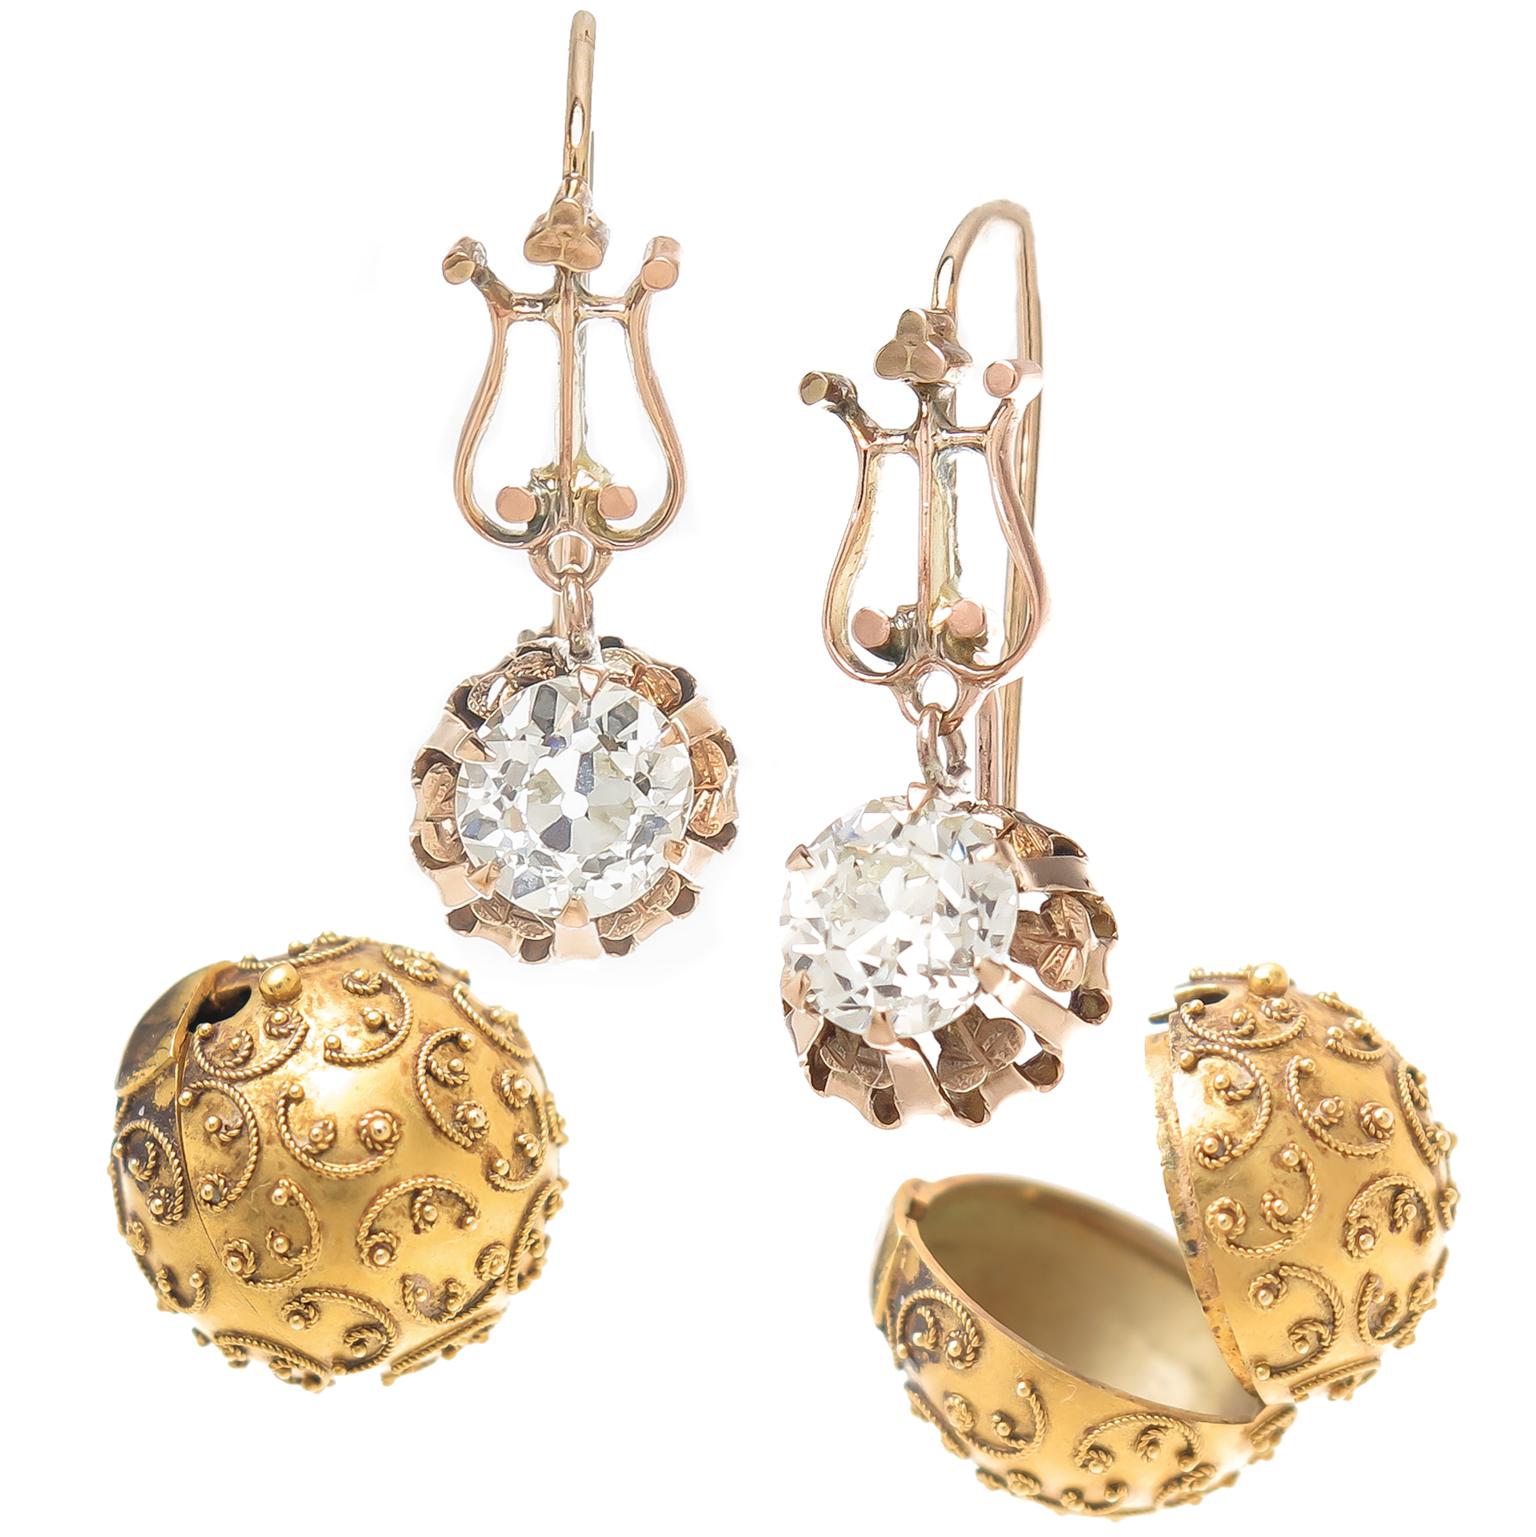 day-and-night-earrings-09202016-7.jpg